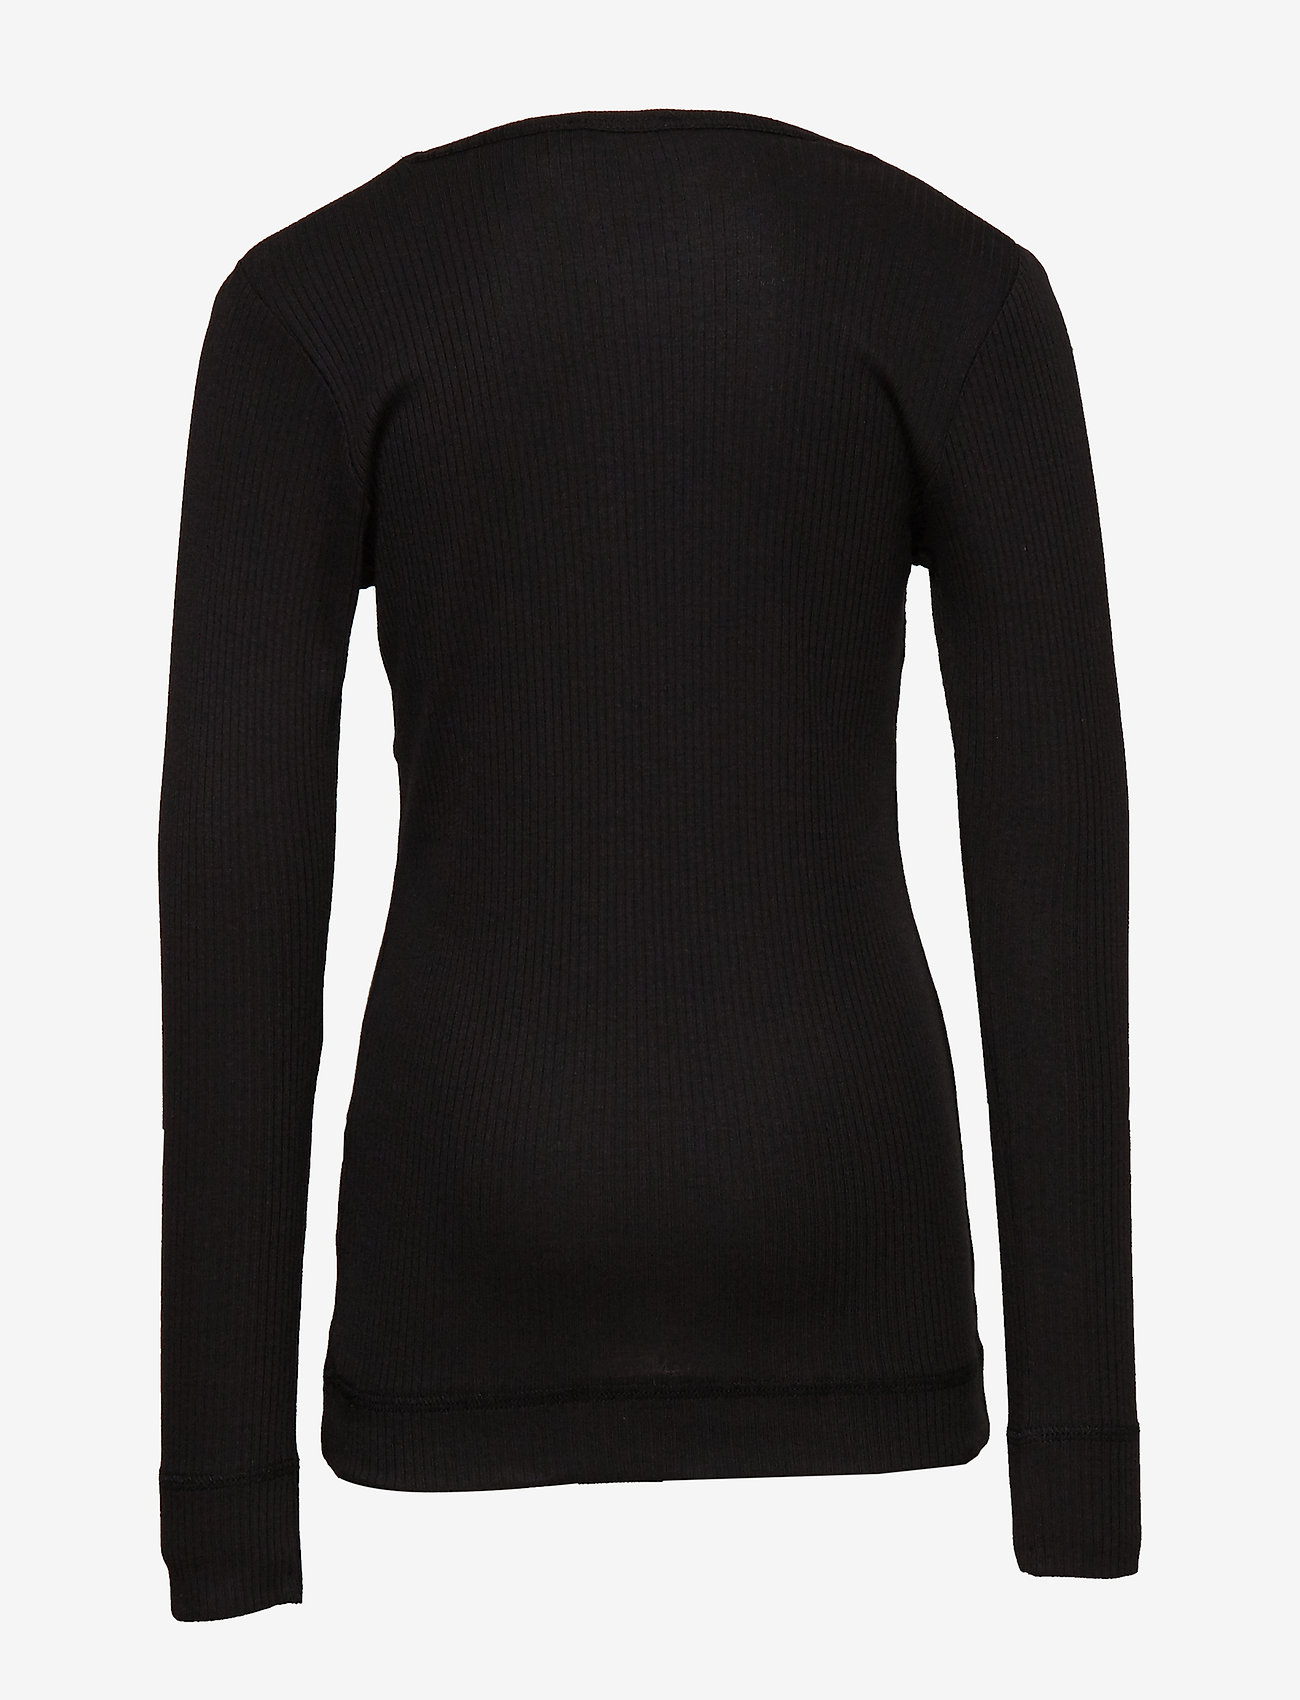 MarMar Cph - Plain Tee LS - long-sleeved t-shirts - black - 1